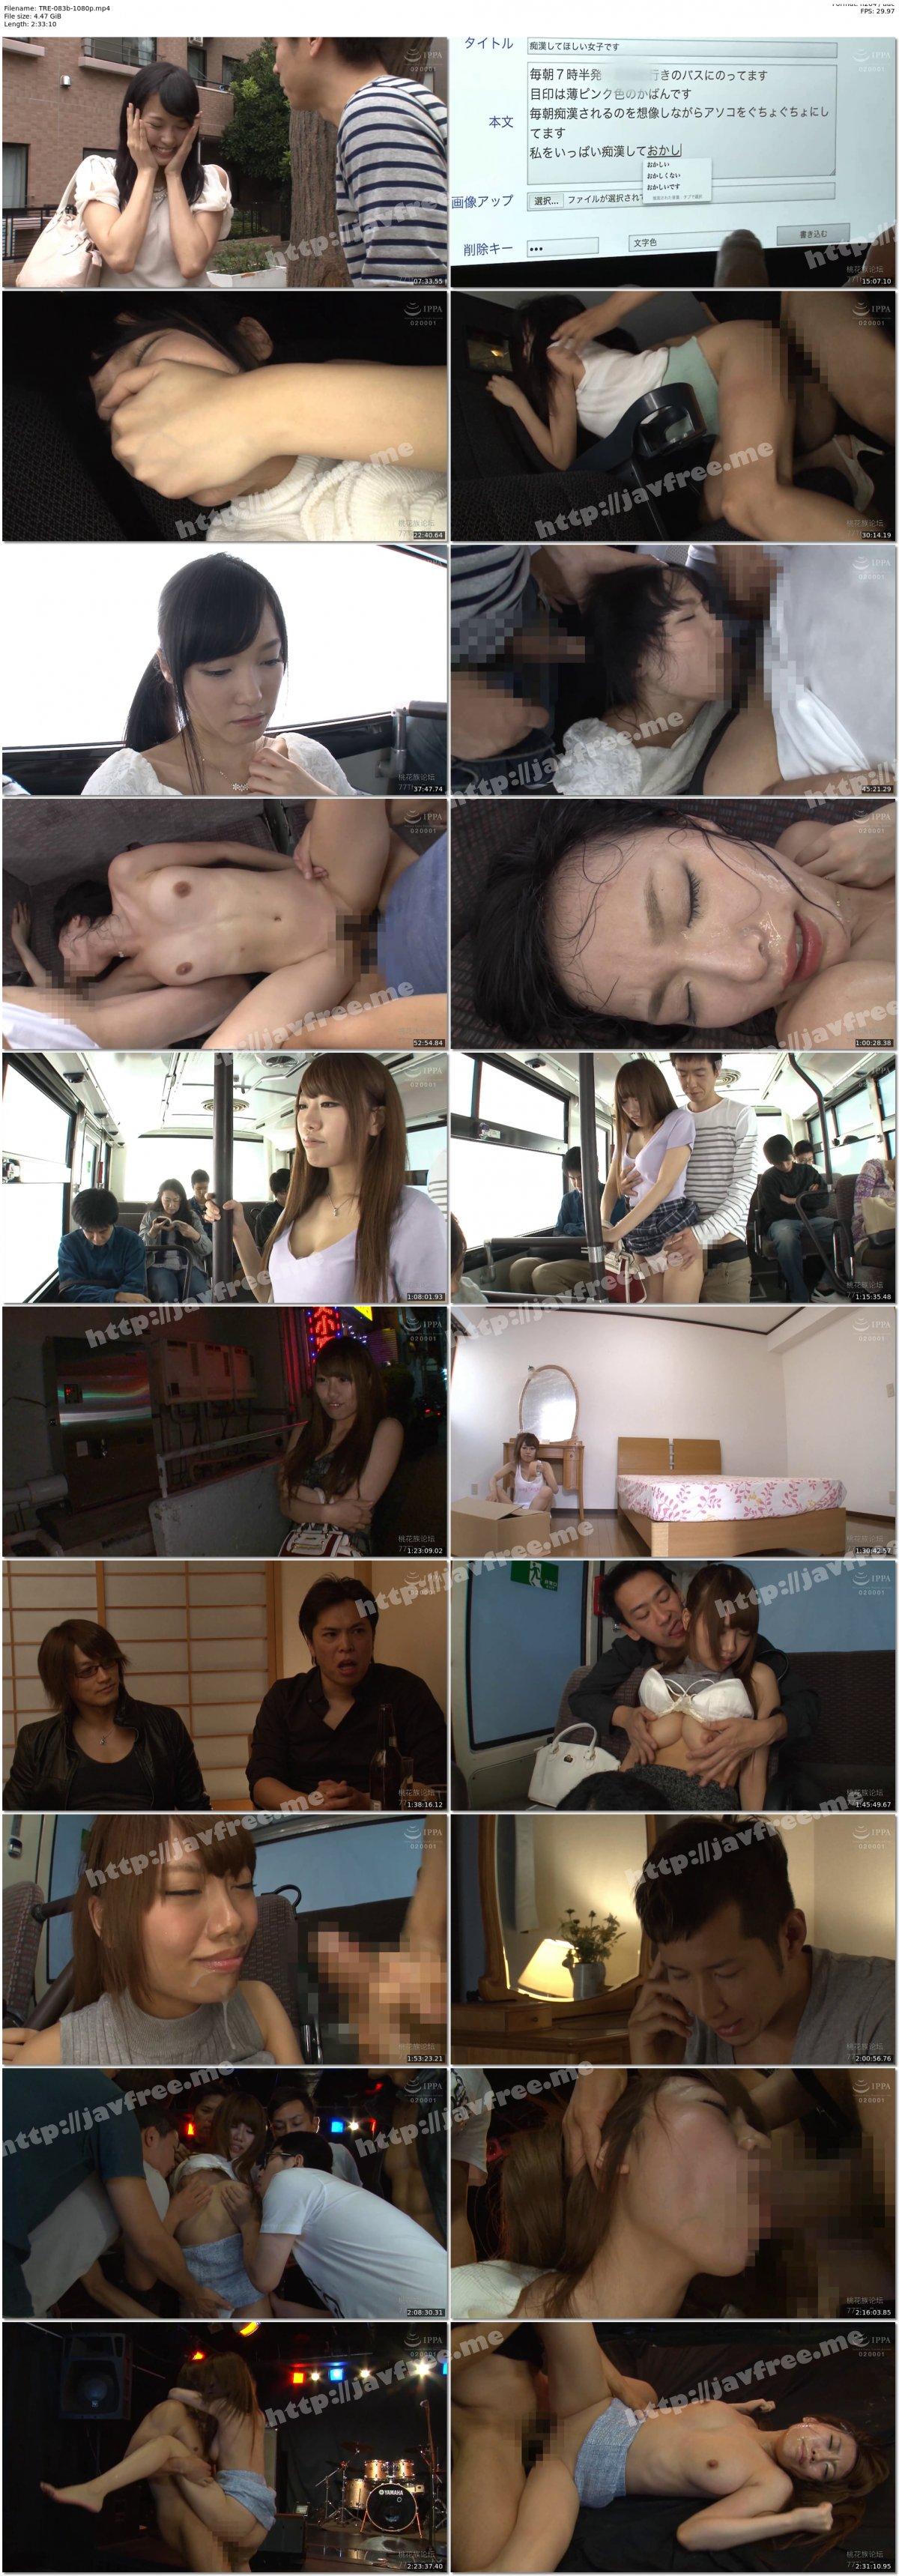 [HD][TRE-083] 美少女7名痴漢&輪姦BEST - image TRE-083b-1080p on https://javfree.me